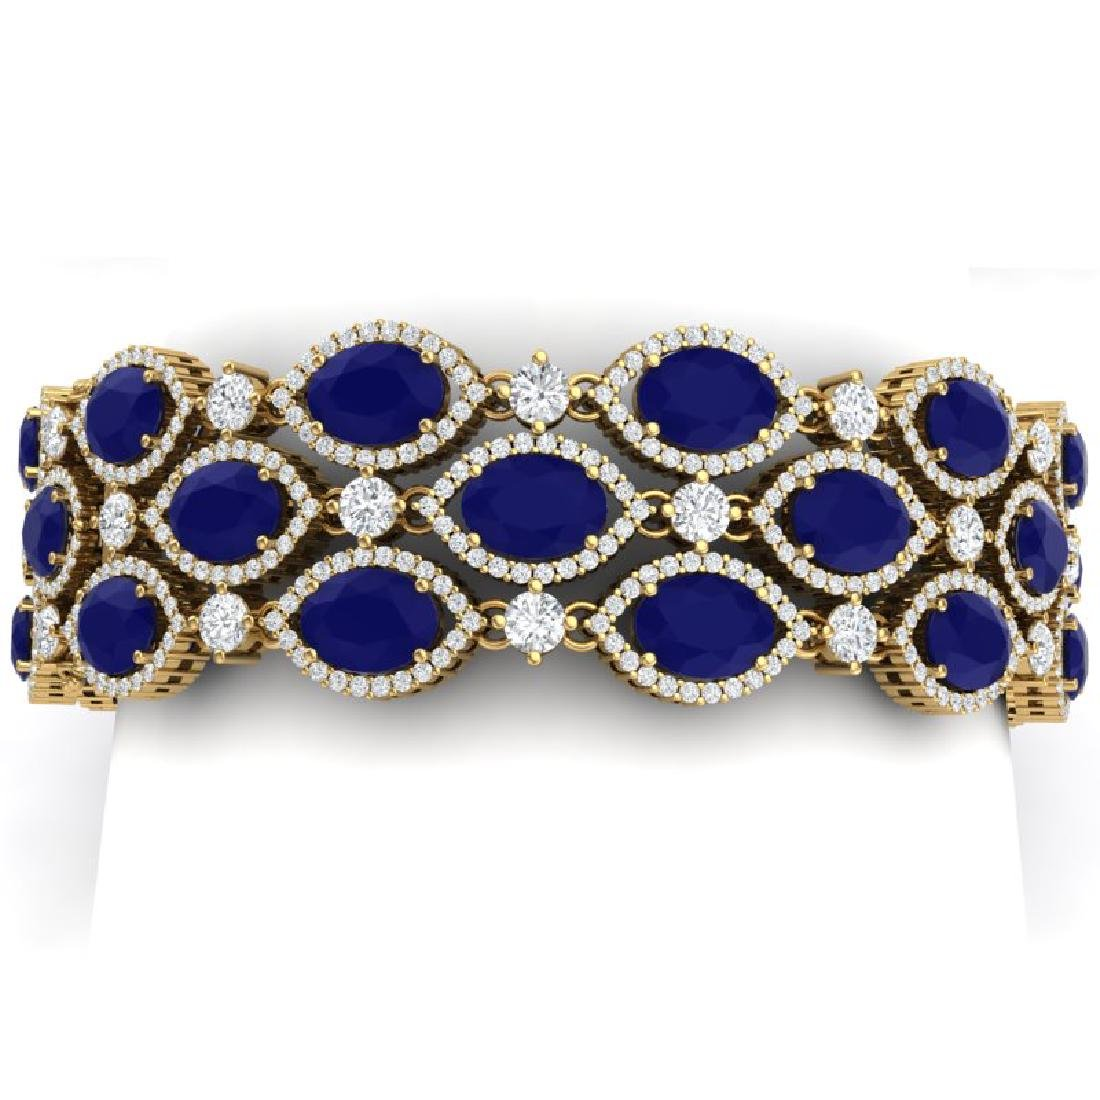 47.84 CTW Royalty Sapphire & VS Diamond Bracelet 18K